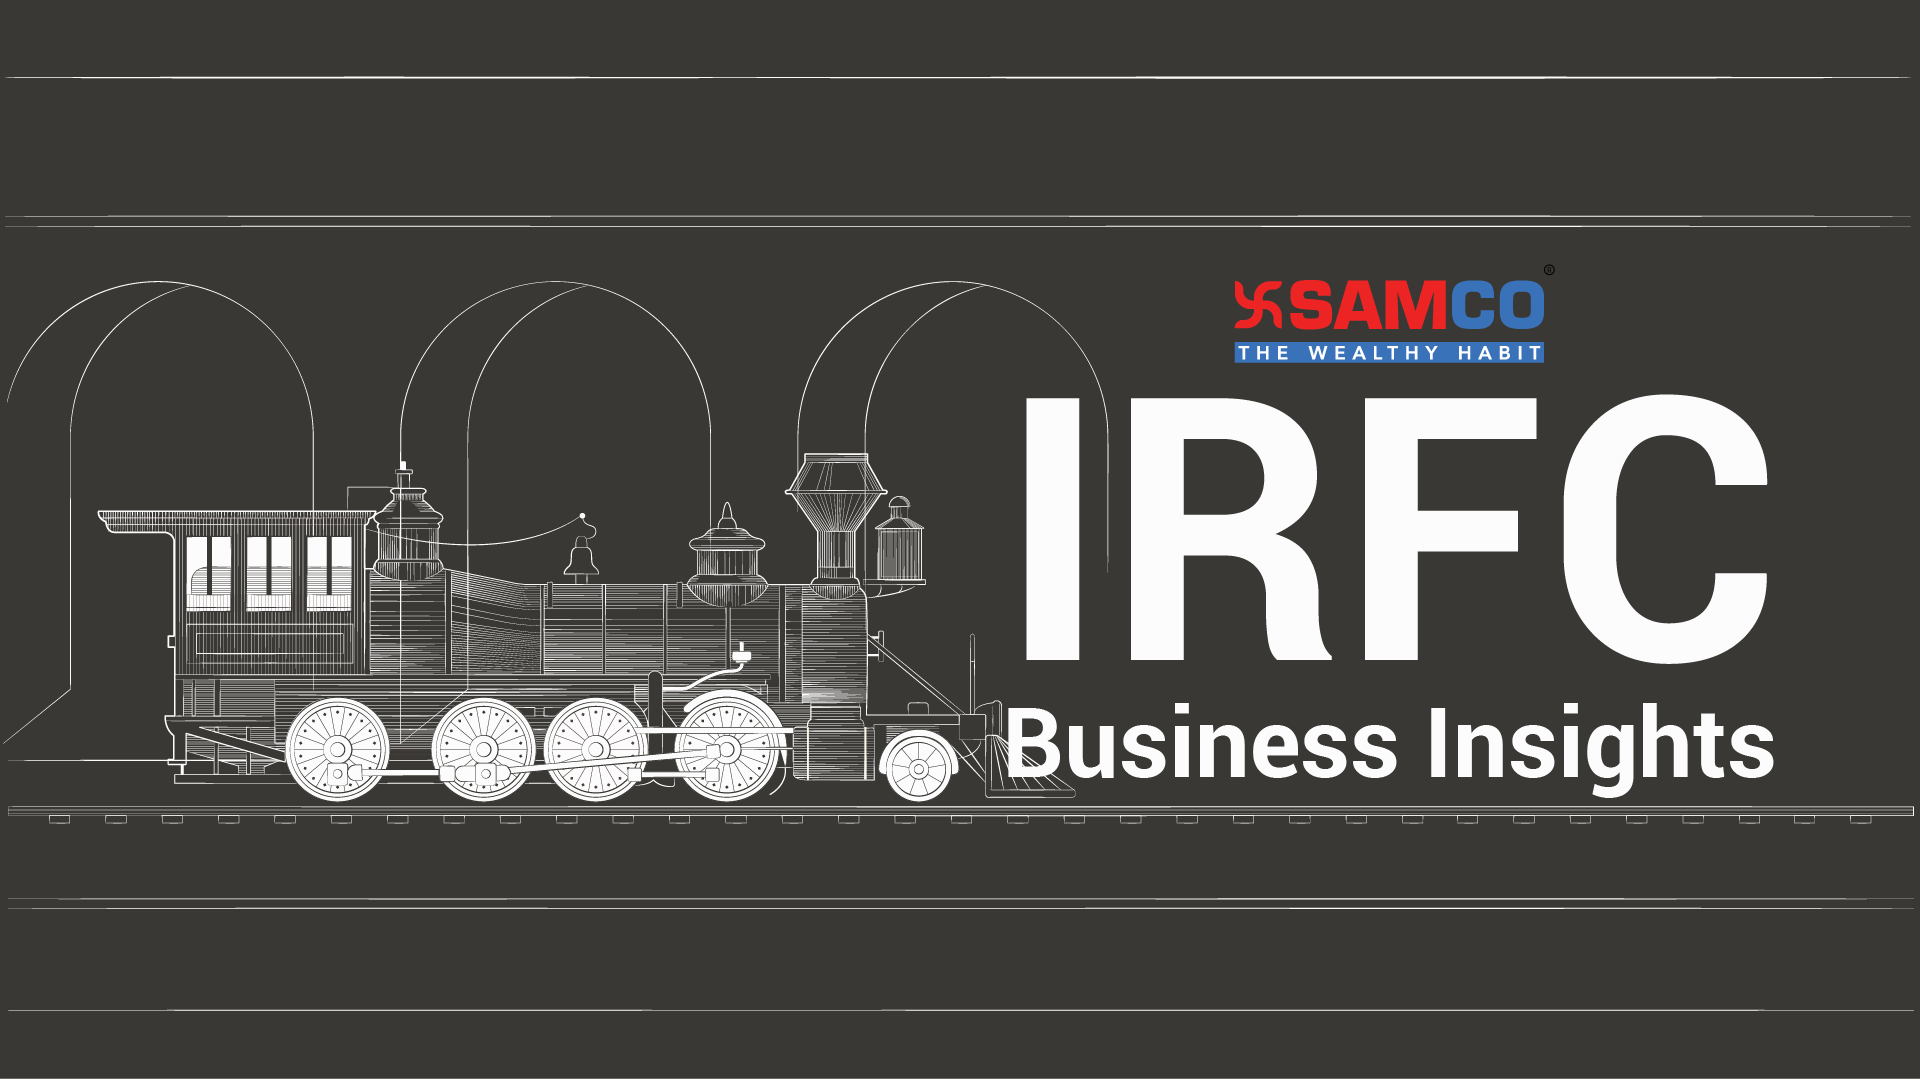 IRFC Business Insights